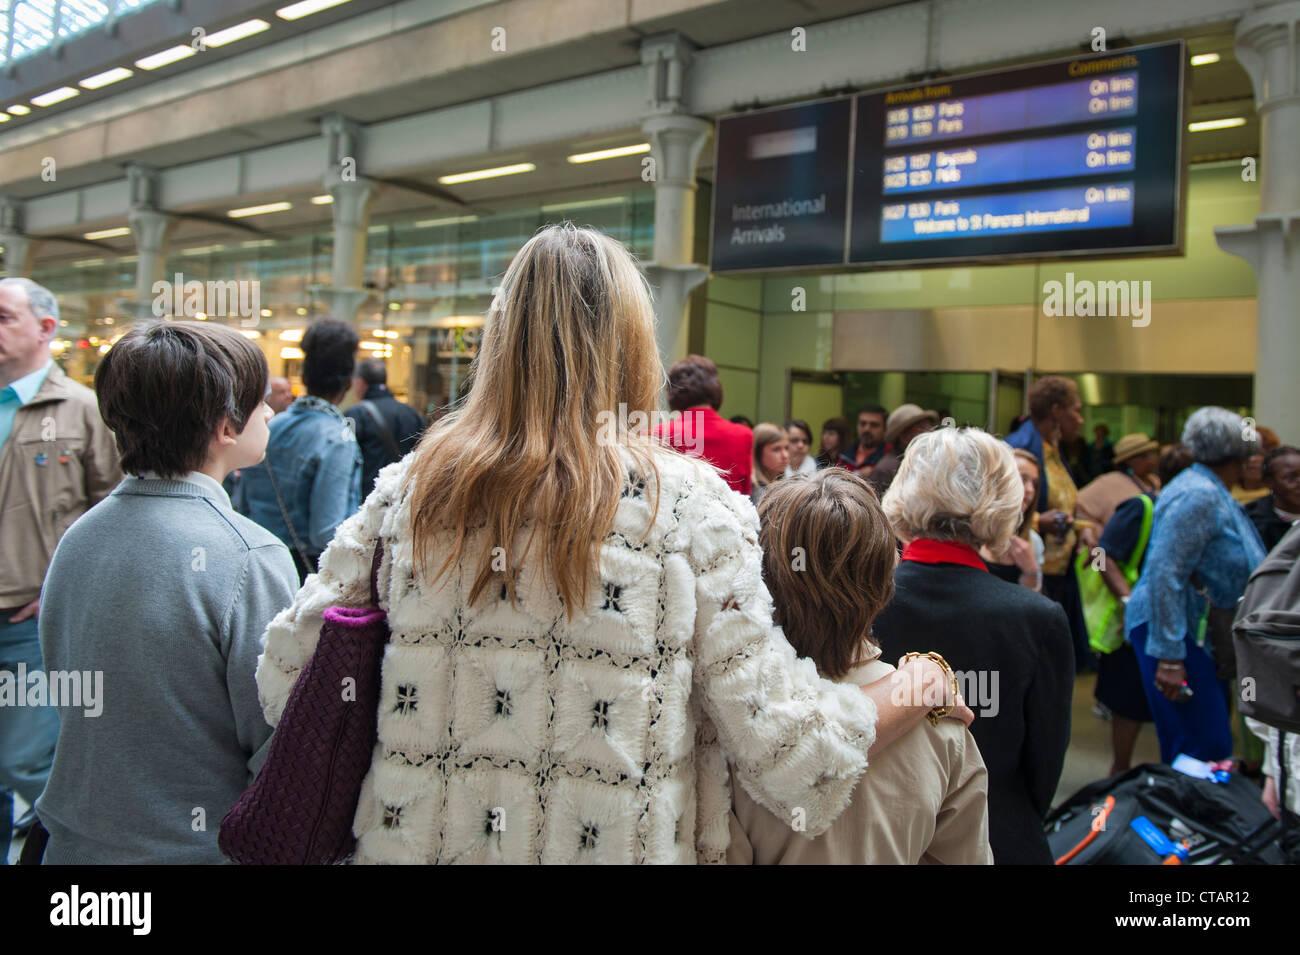 London St Pancras Station zurück Rückansicht der Familie Mutter Jungs warten am Gate von Zug Ankunft Informationsdisplay Stockbild